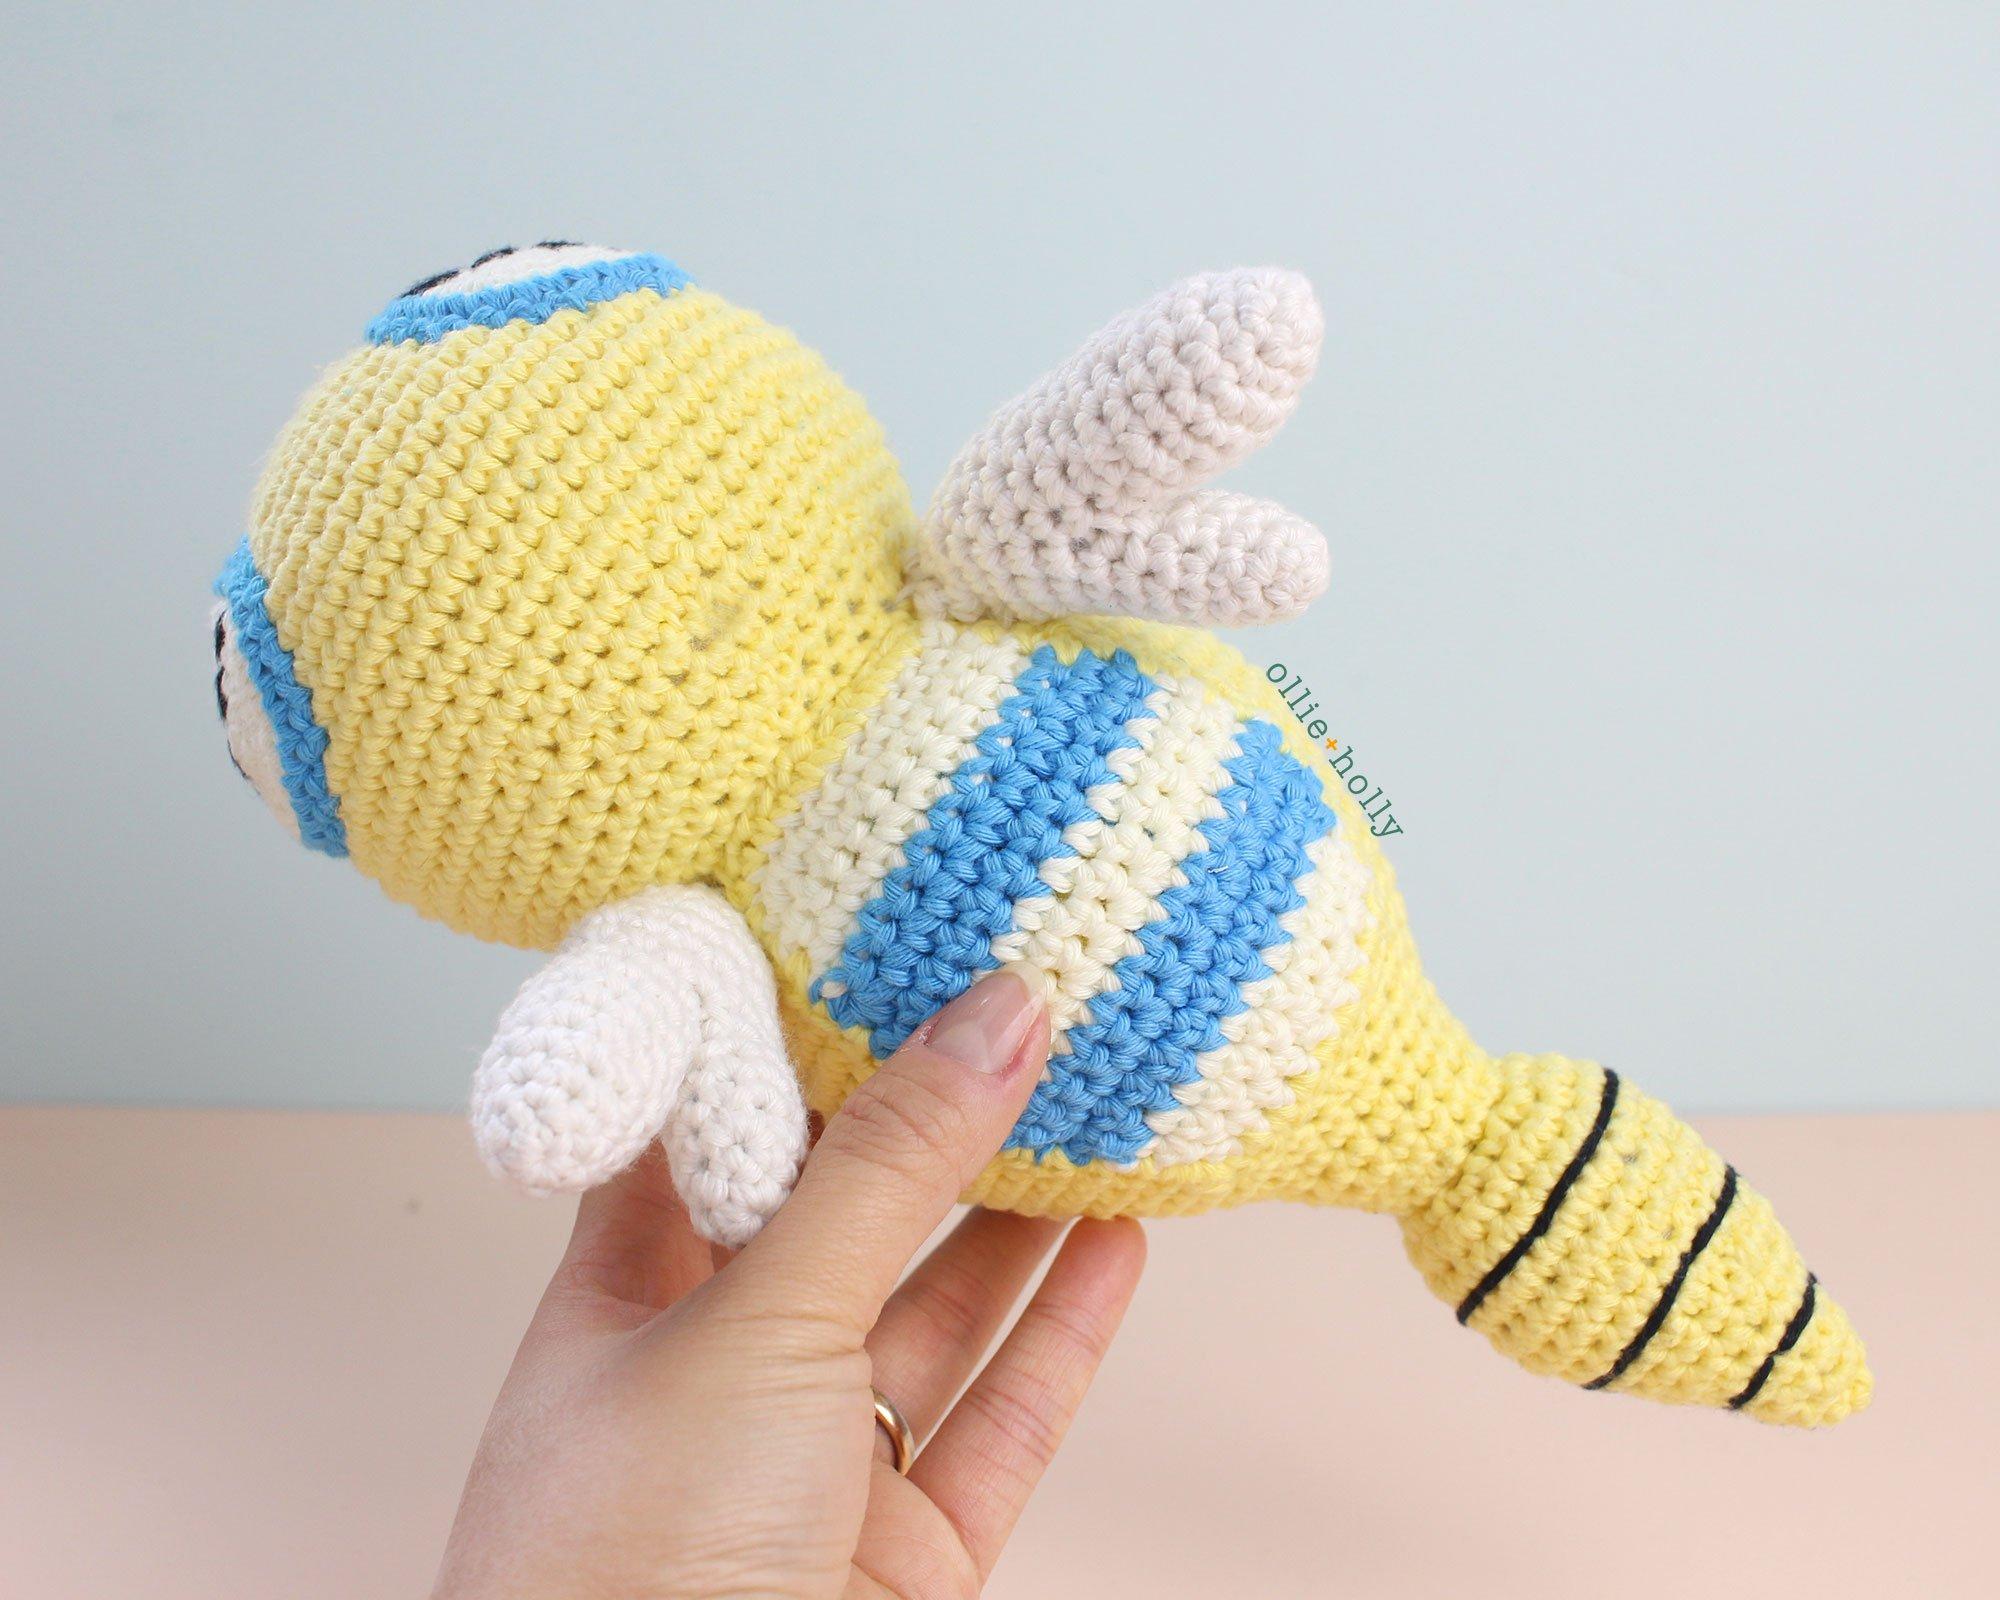 Free Dunsparce Pokemon Amigurumi Crochet Pattern Step 26